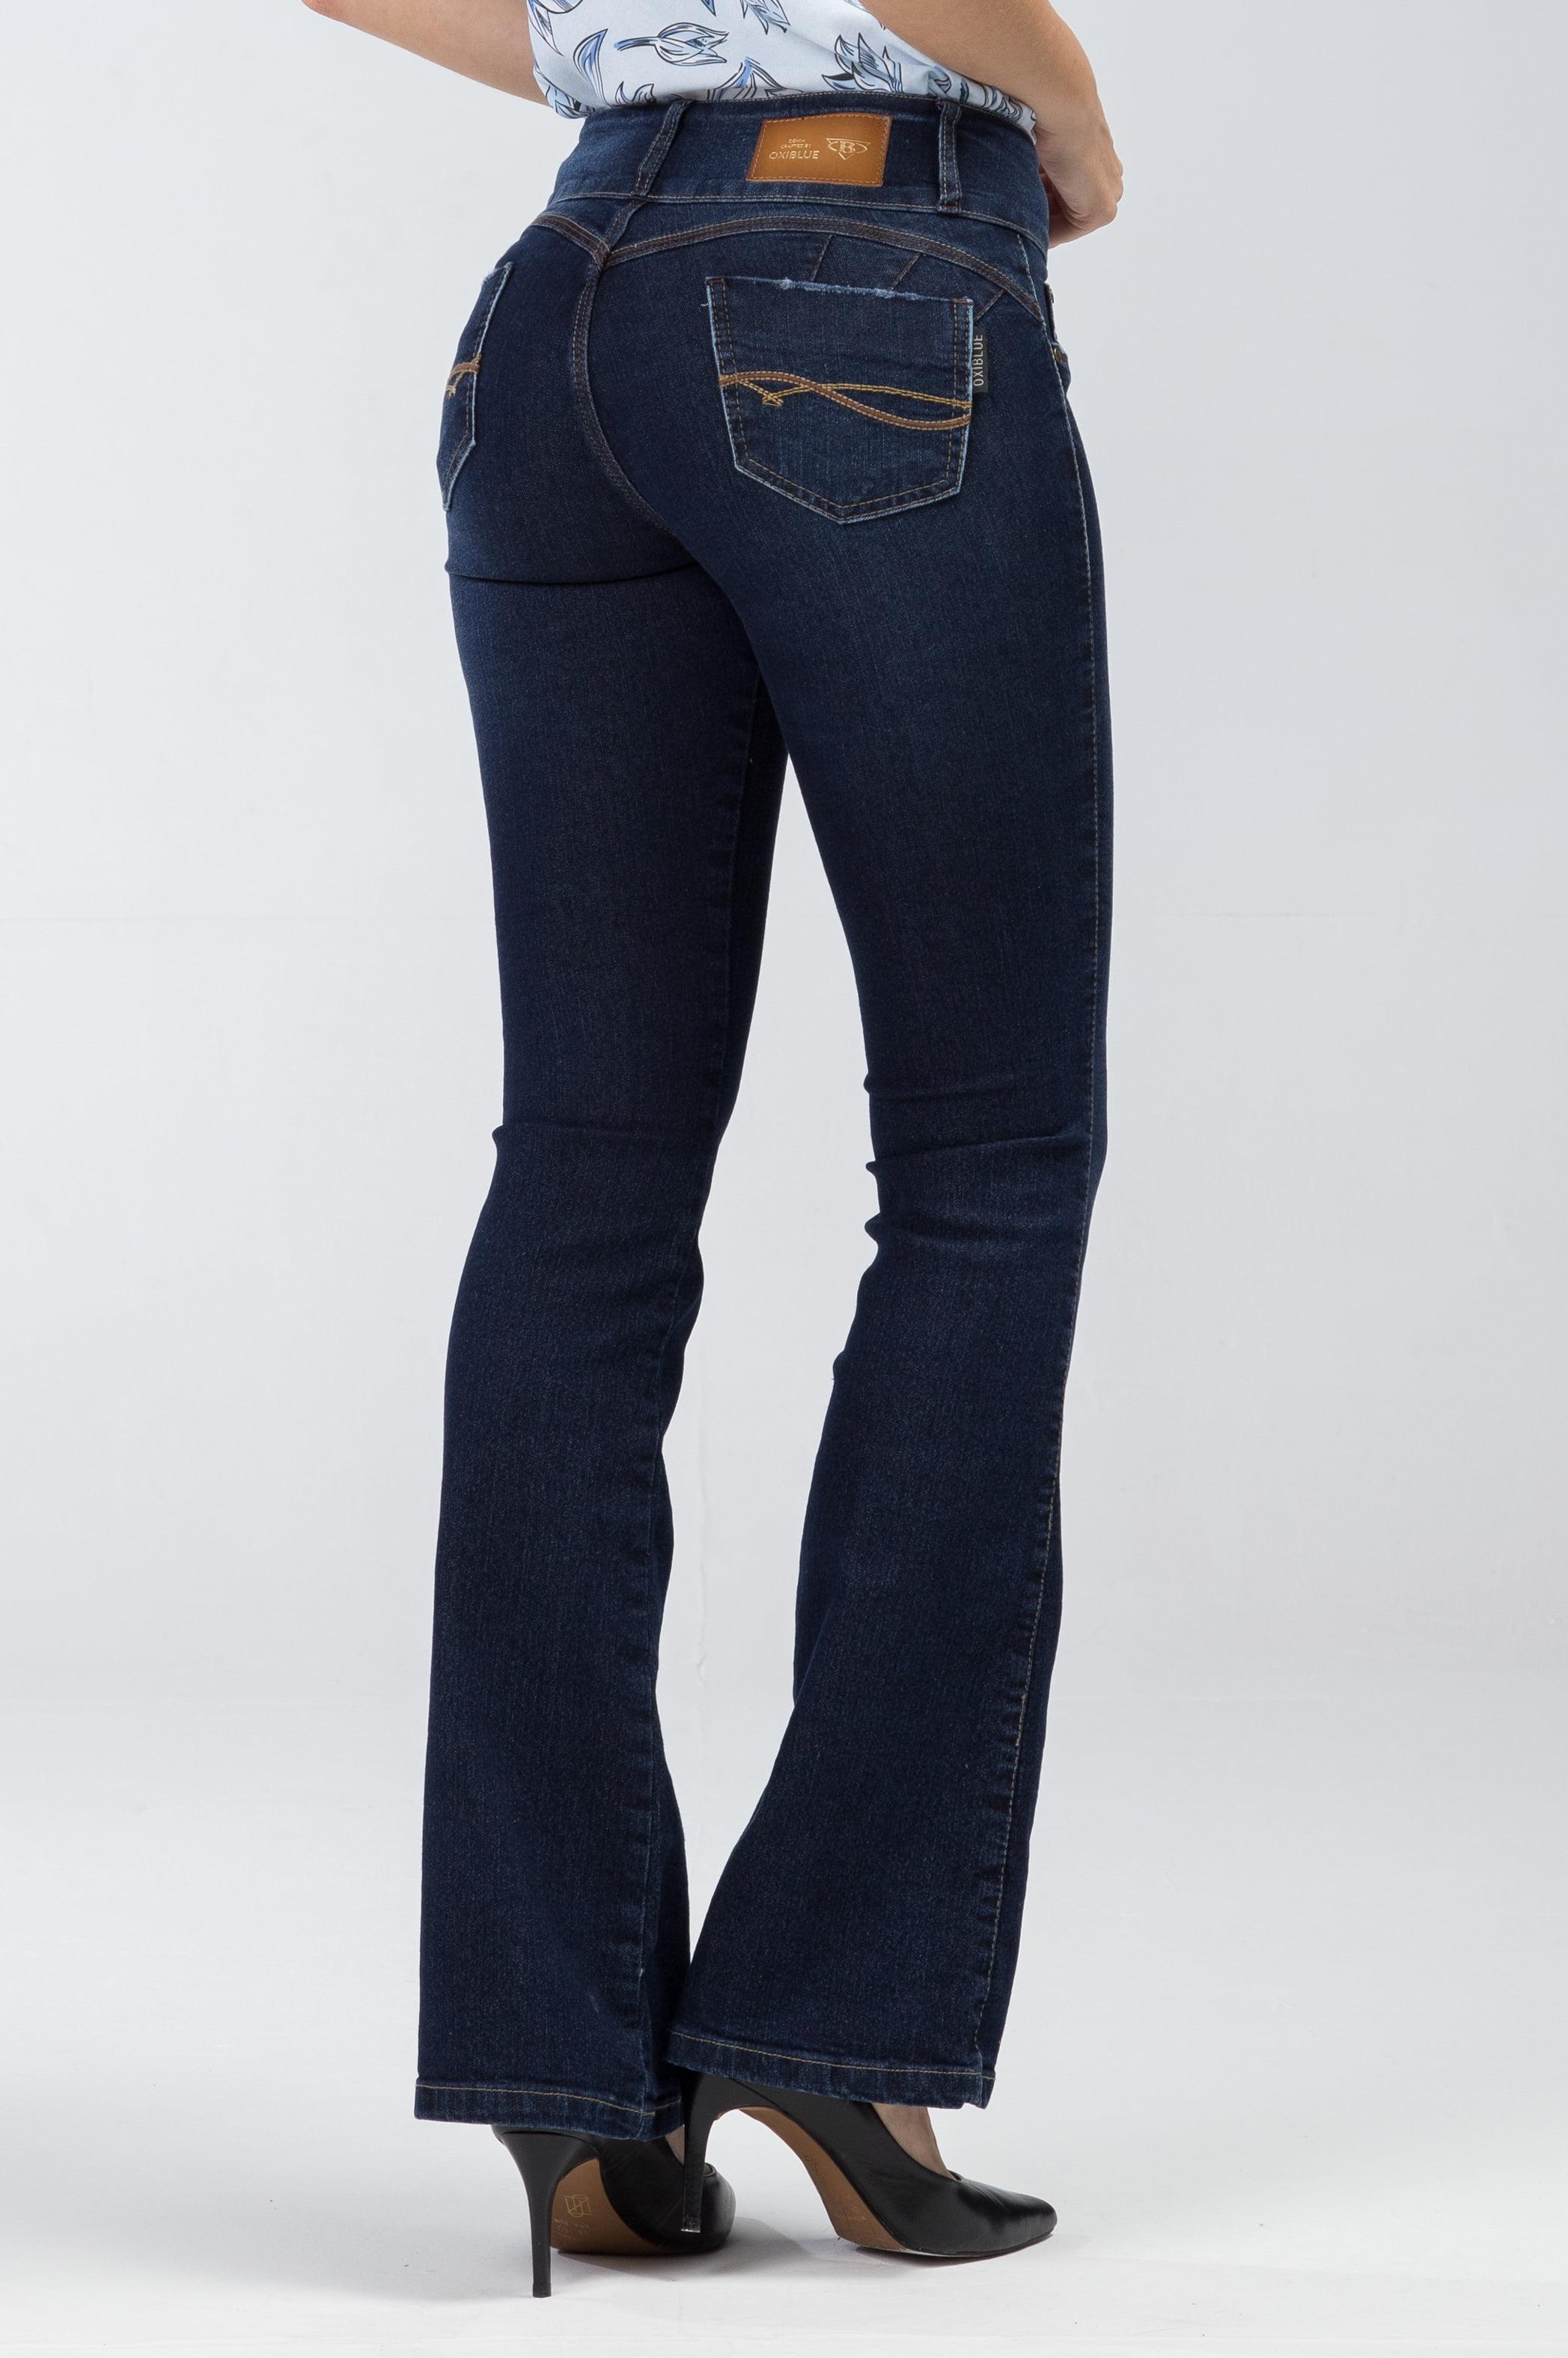 Calça Flare Jeans Levanta Bumbum F2020241